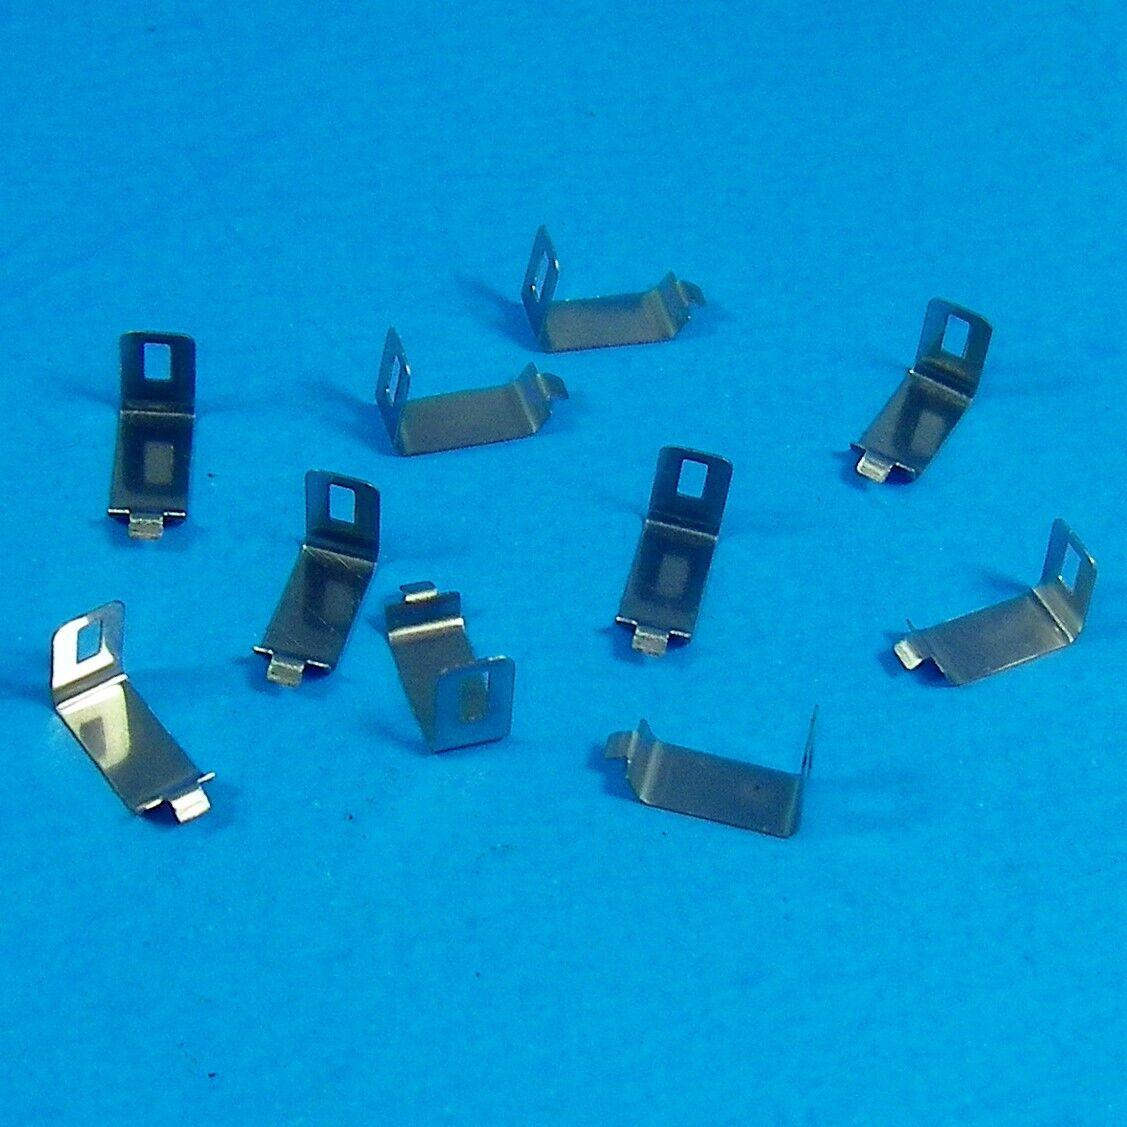 "Car Parts - HO Slot Car Parts Life Like ""T"" Pickup Shoe Lot of 5 sets 10 PCS. New Shoes WOW"